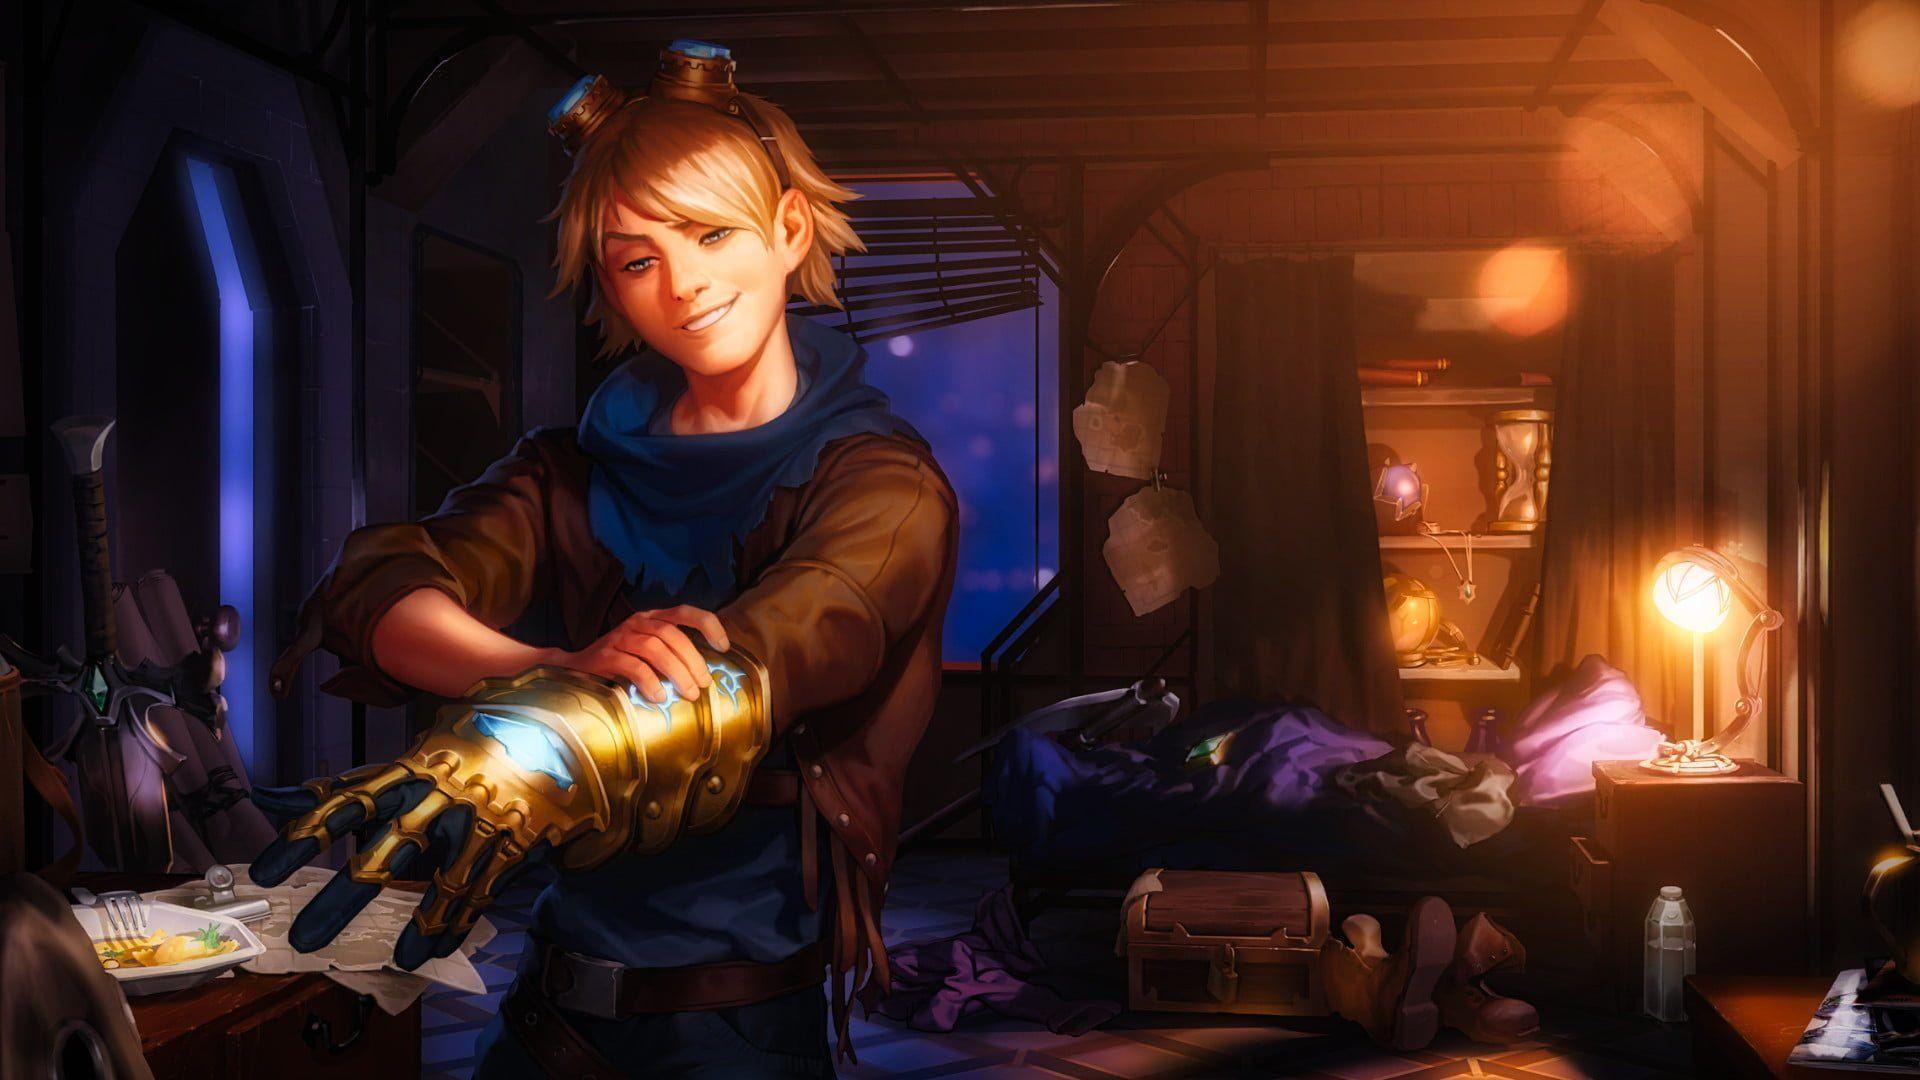 Legends Of Runeterra Wallpapers in 2020 | League, Character ...